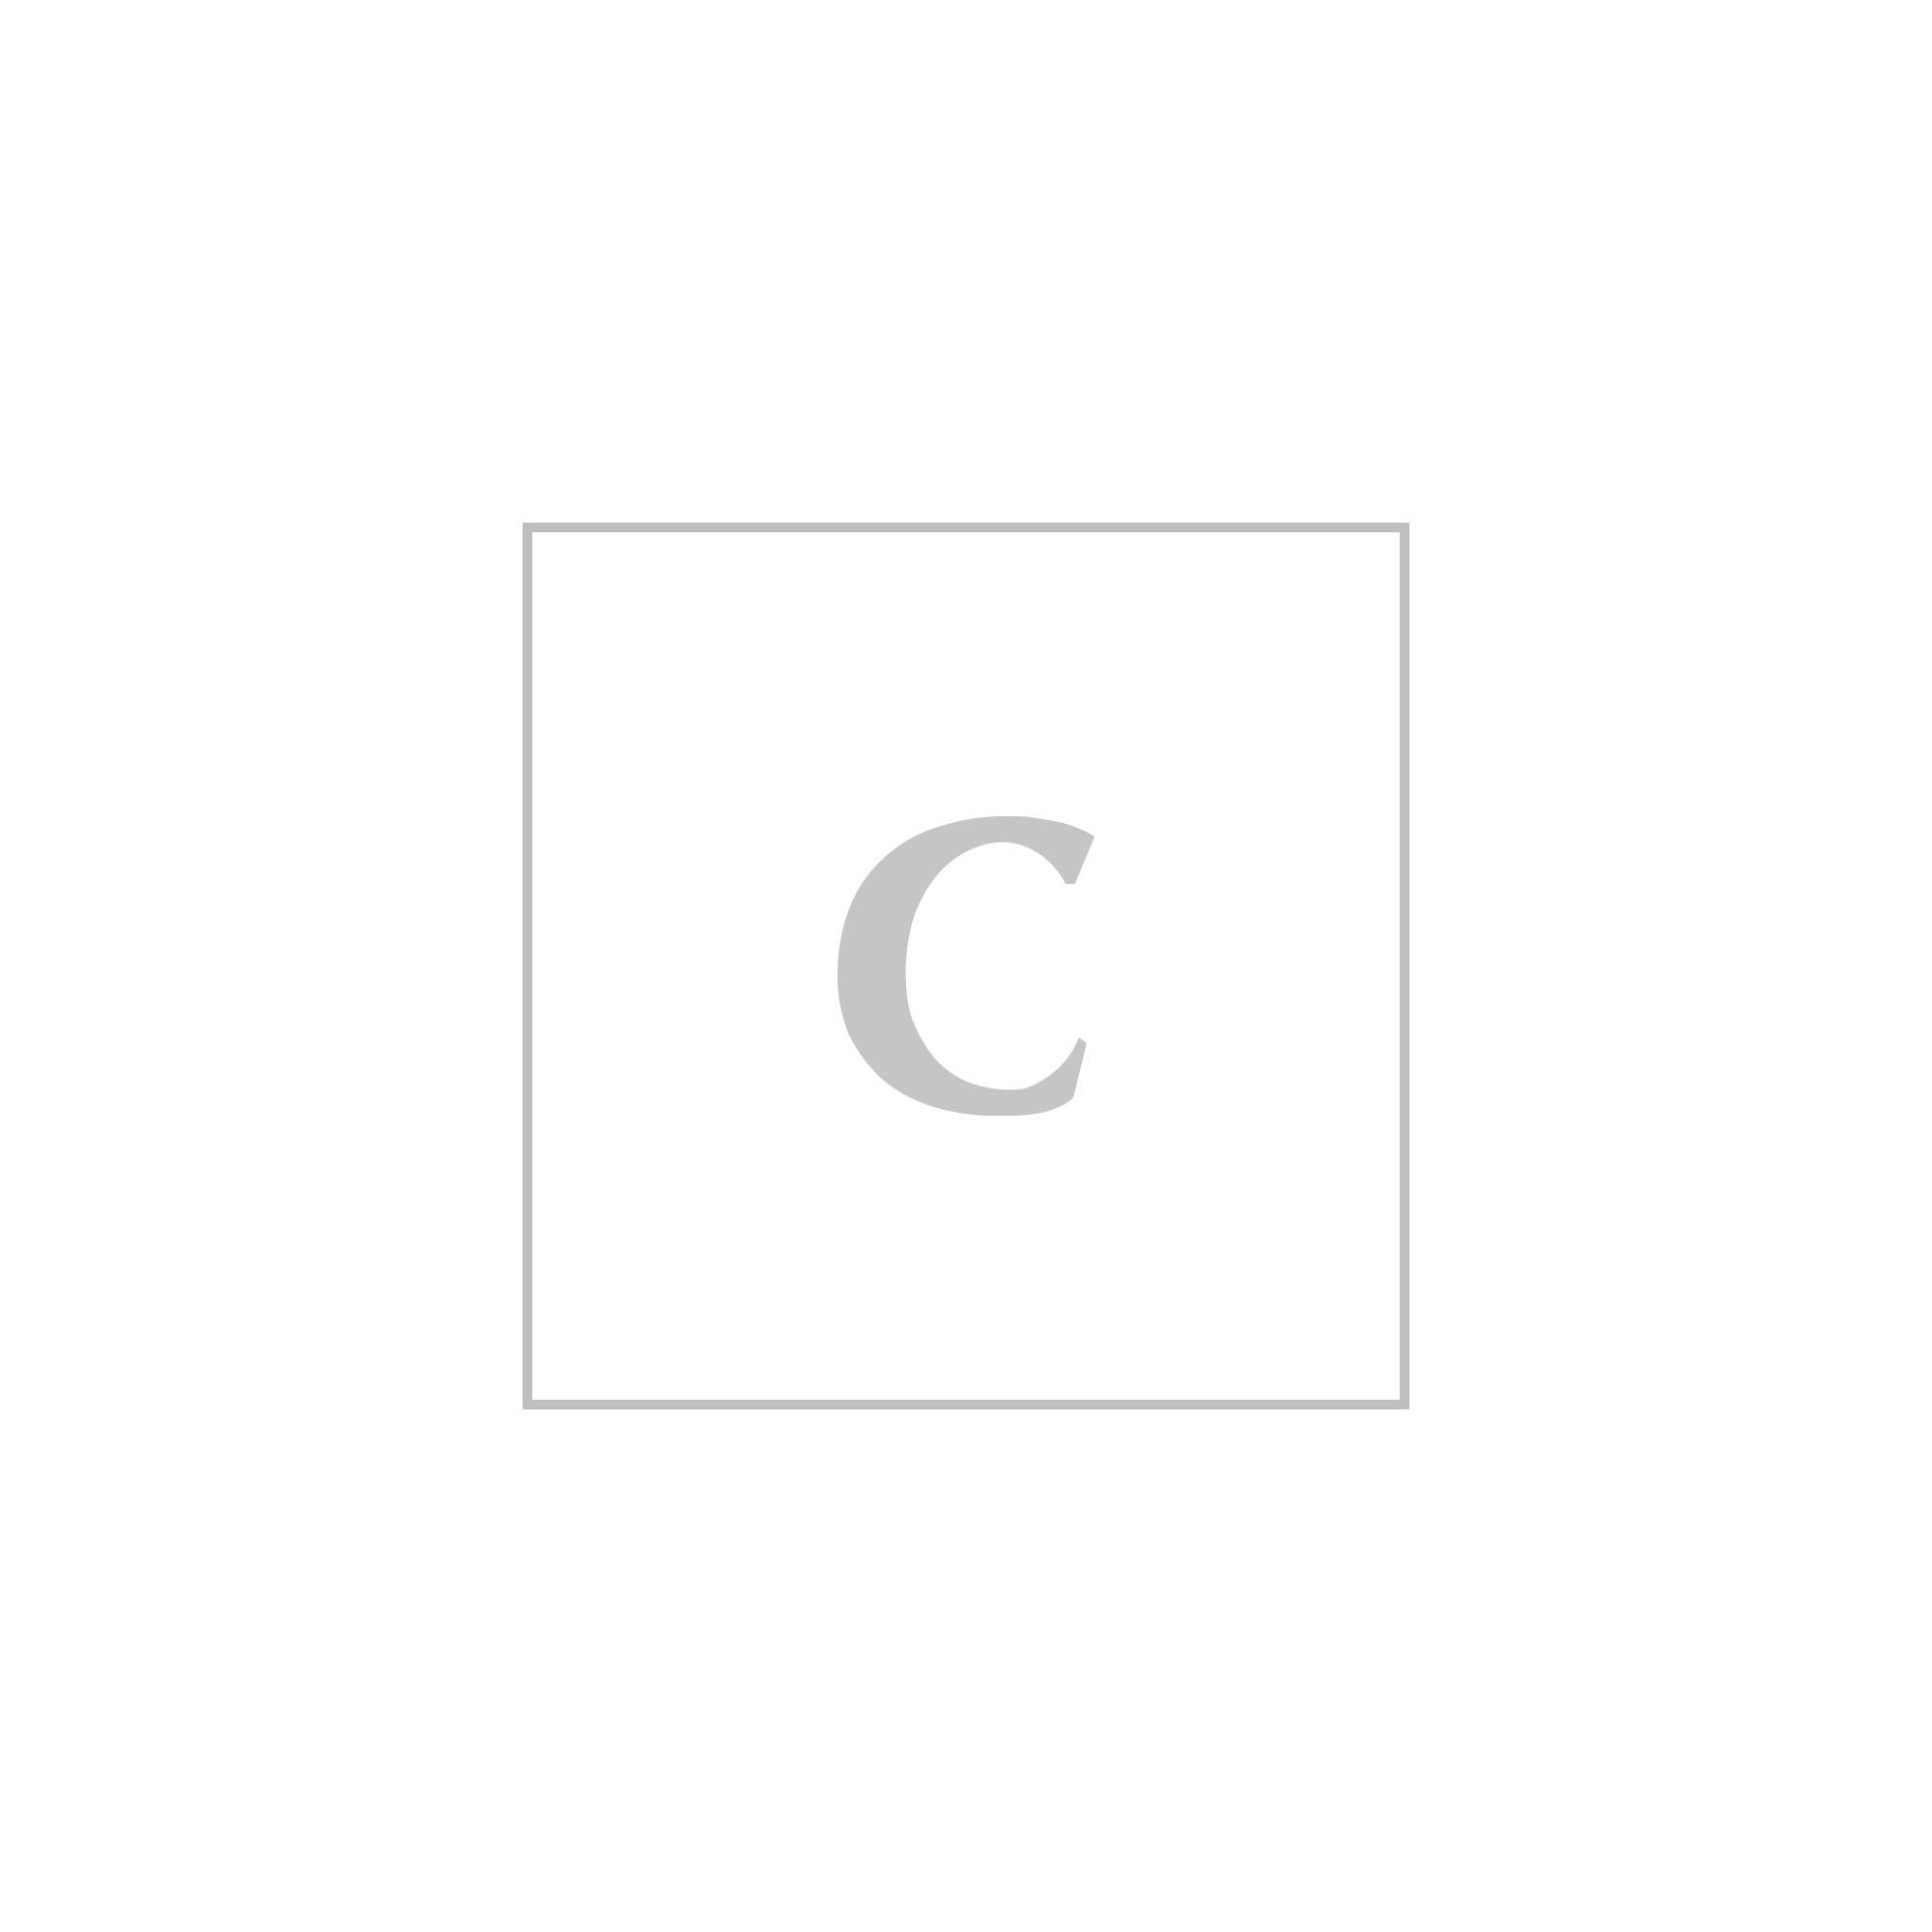 Burberry cappotto 119sanfdringhaml45uc